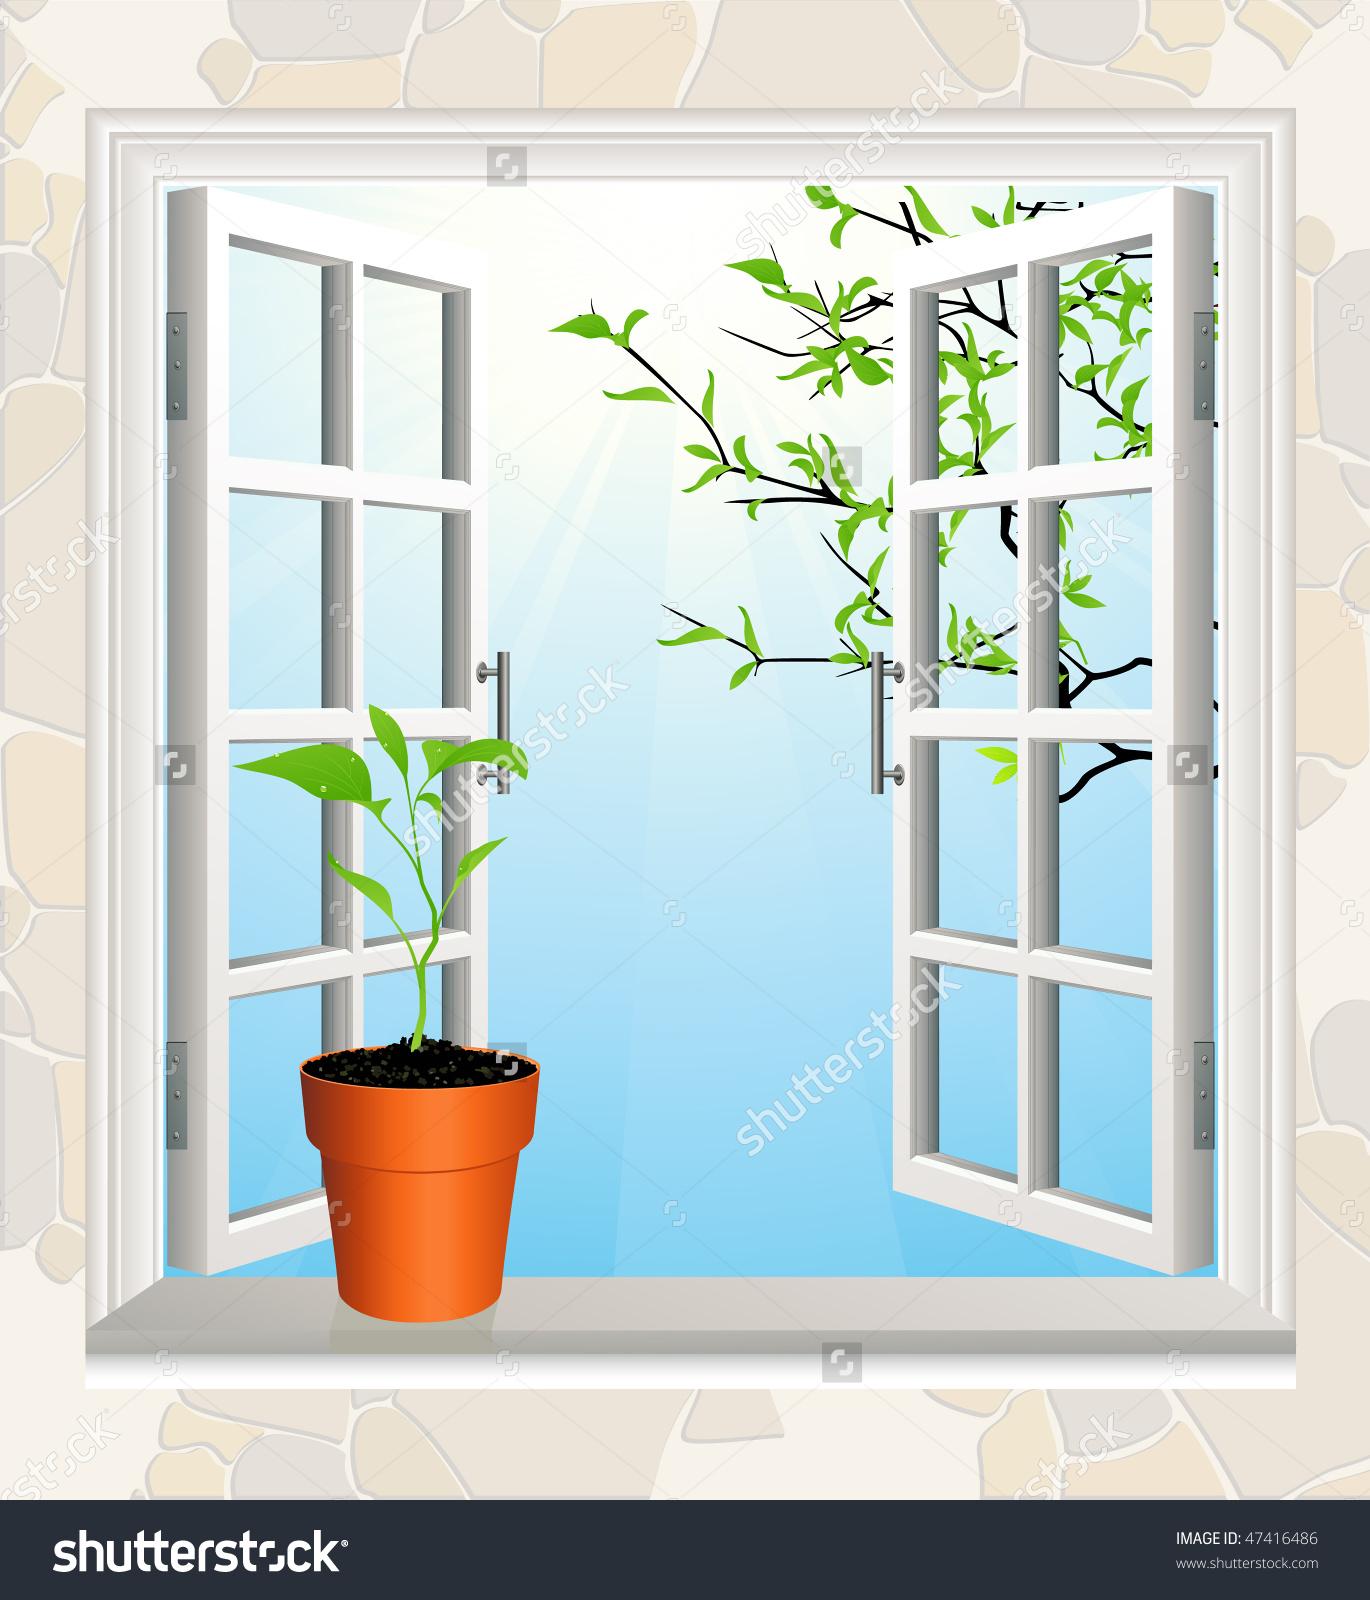 Window clipart window sill Windowsill clipart lightbox or Window